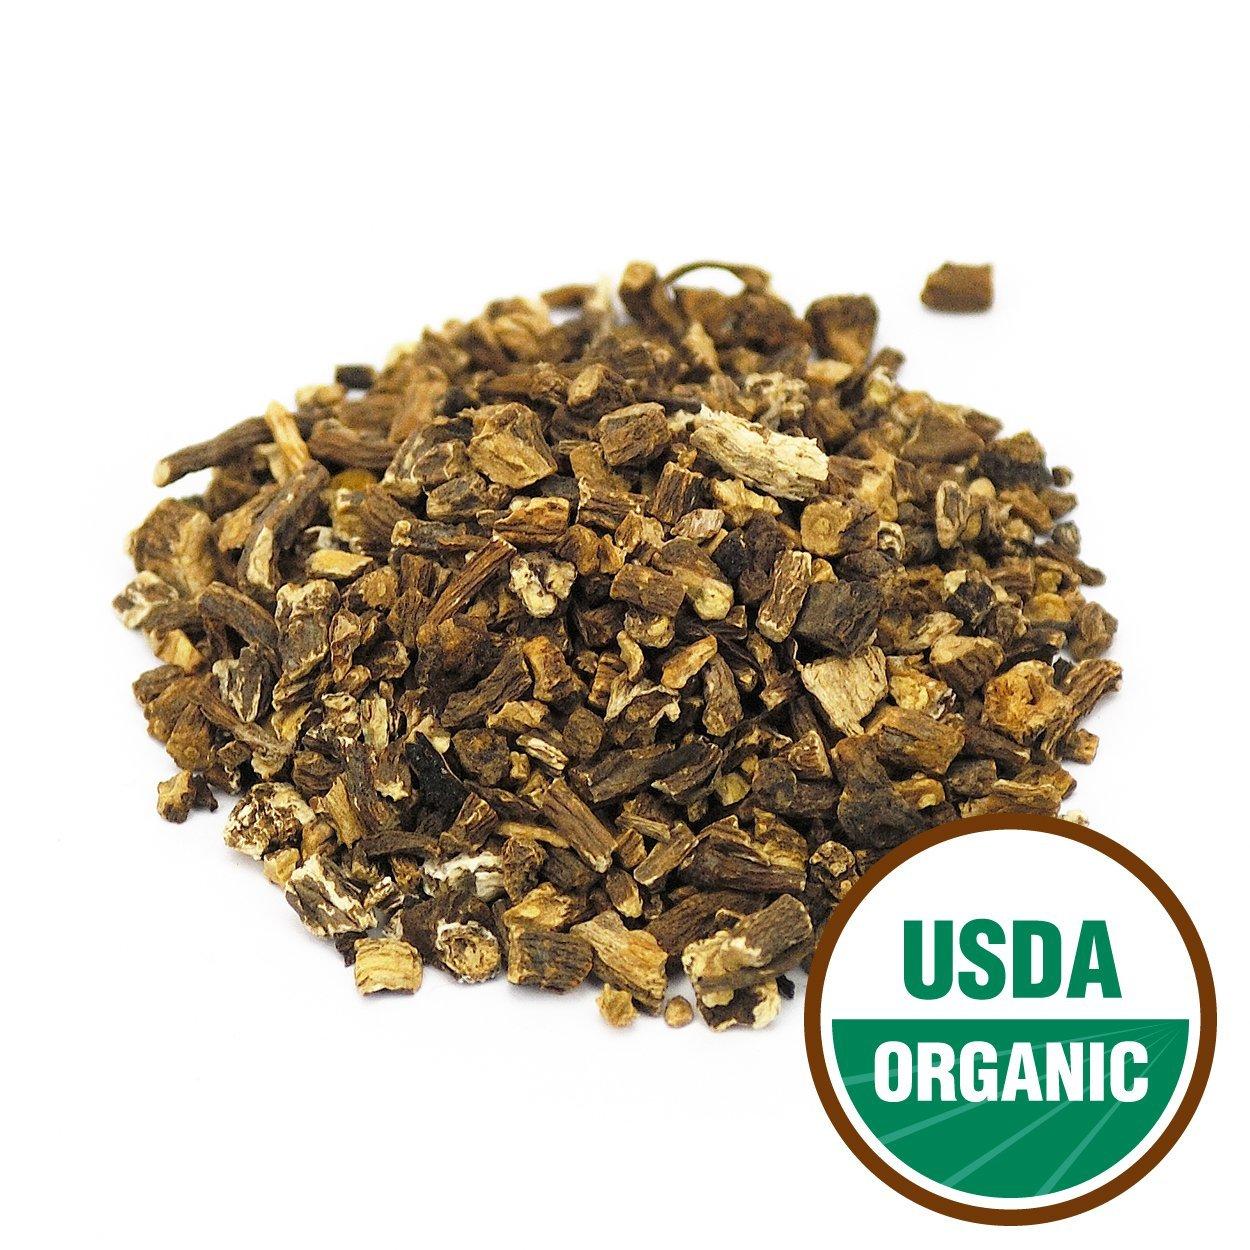 Bulk herbs spices organic organic herbal tea - Amazon Com Starwest Botanicals Organic Dandelion Root Tea 1 Pound Bulk Cut Sifted C S Loose Tea Pack Of 2 Grocery Gourmet Food